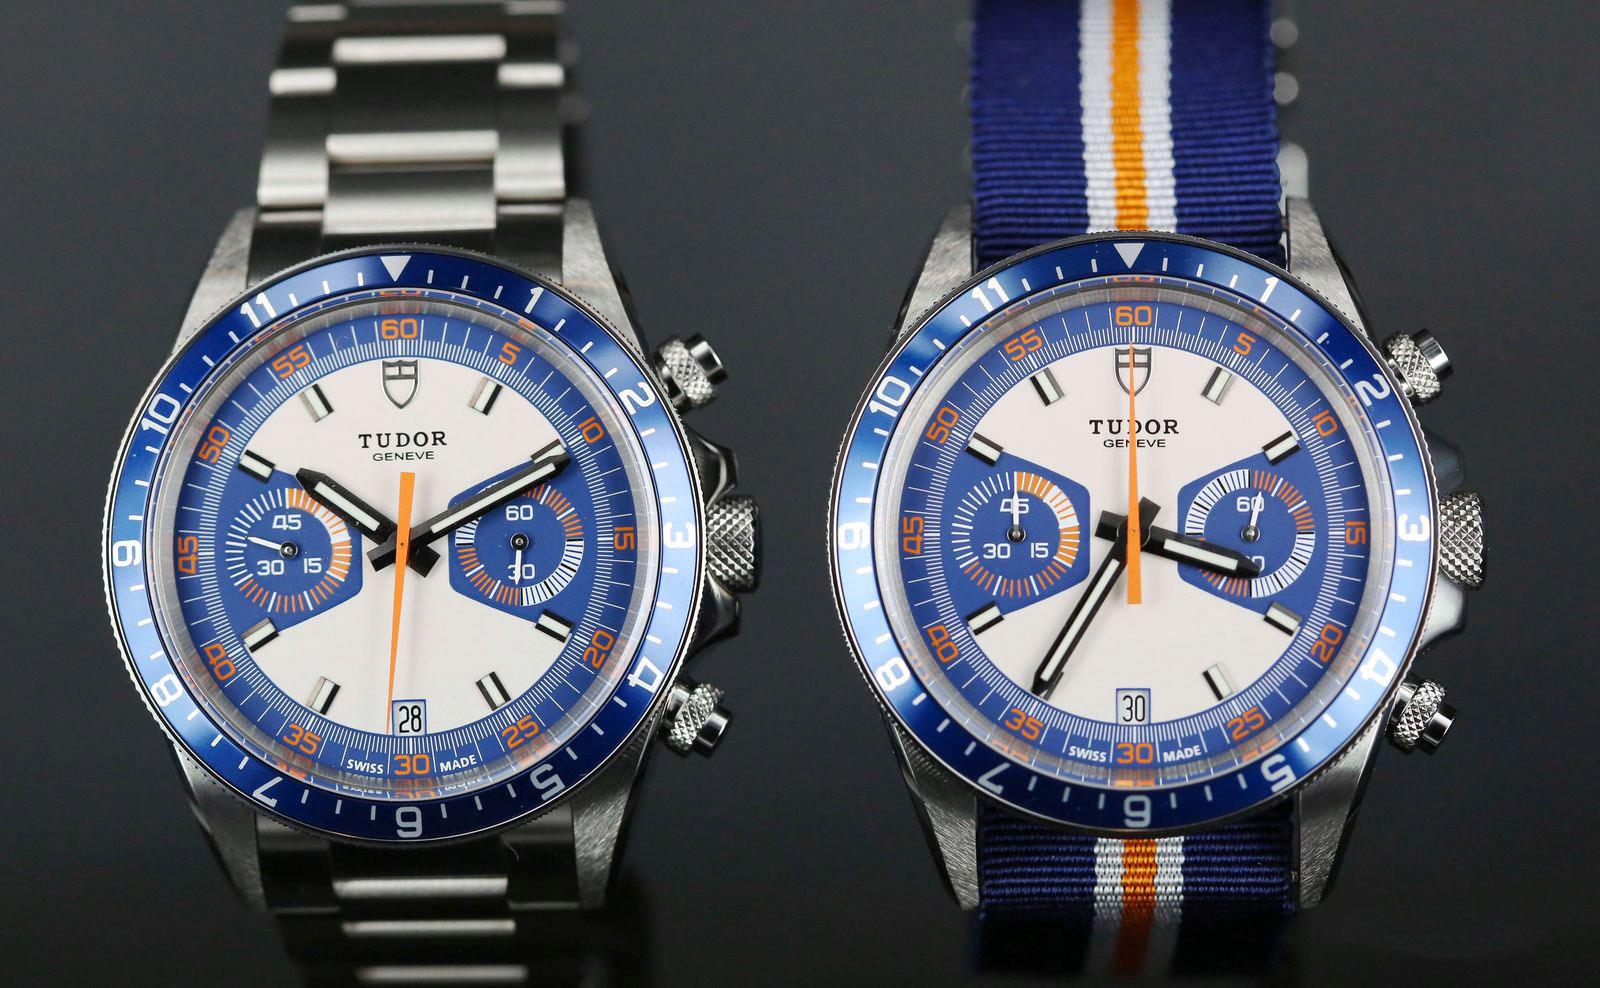 tudor-heritage-chrono-blue-70330B